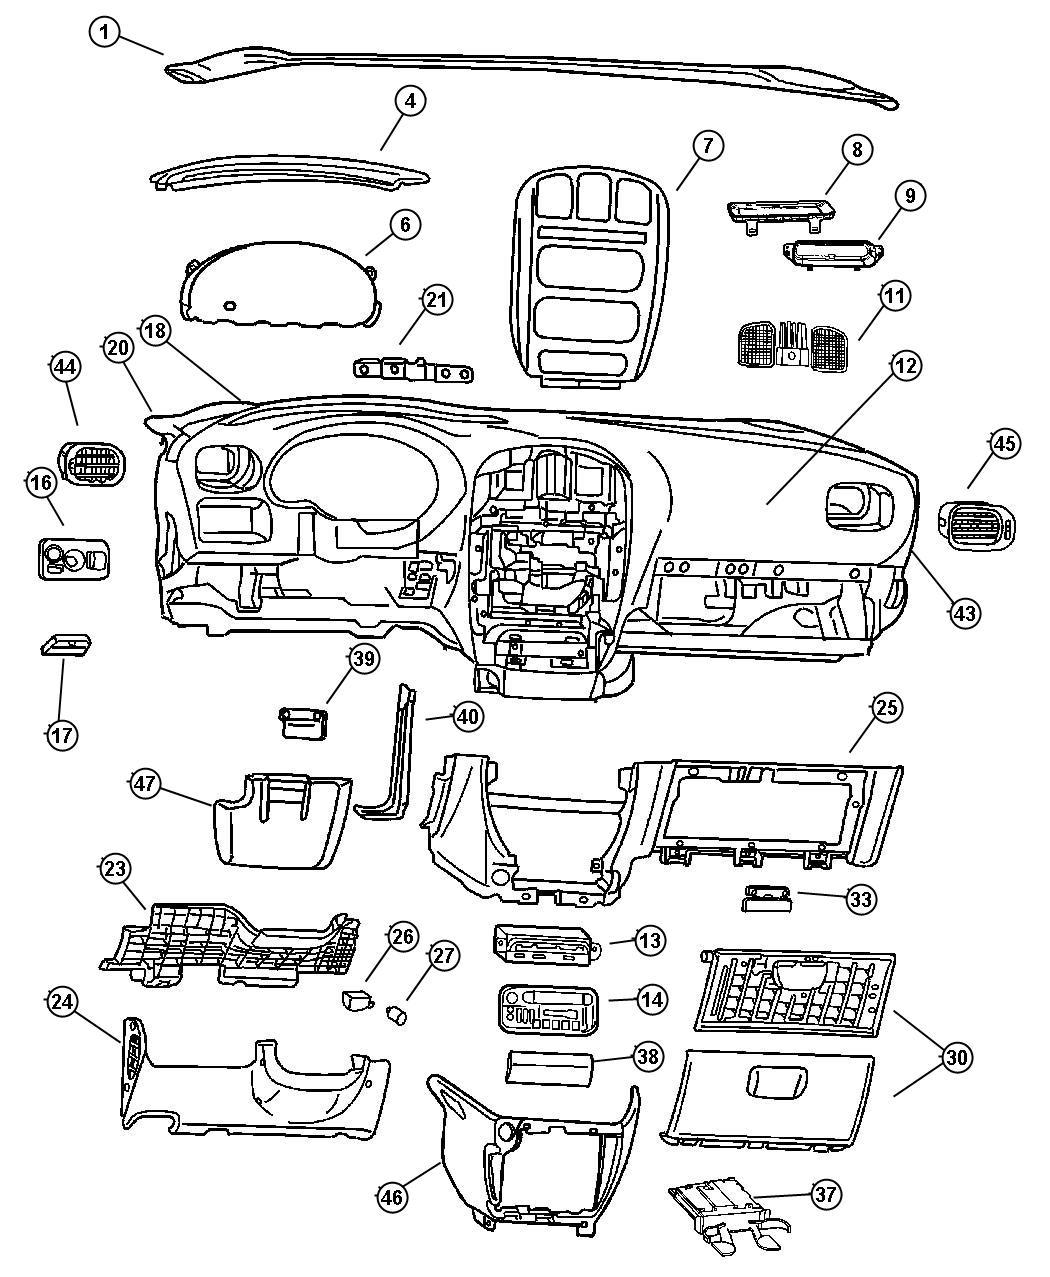 2009 Dodge Ram 5500 Handle. Parking brake. [l5], taupe